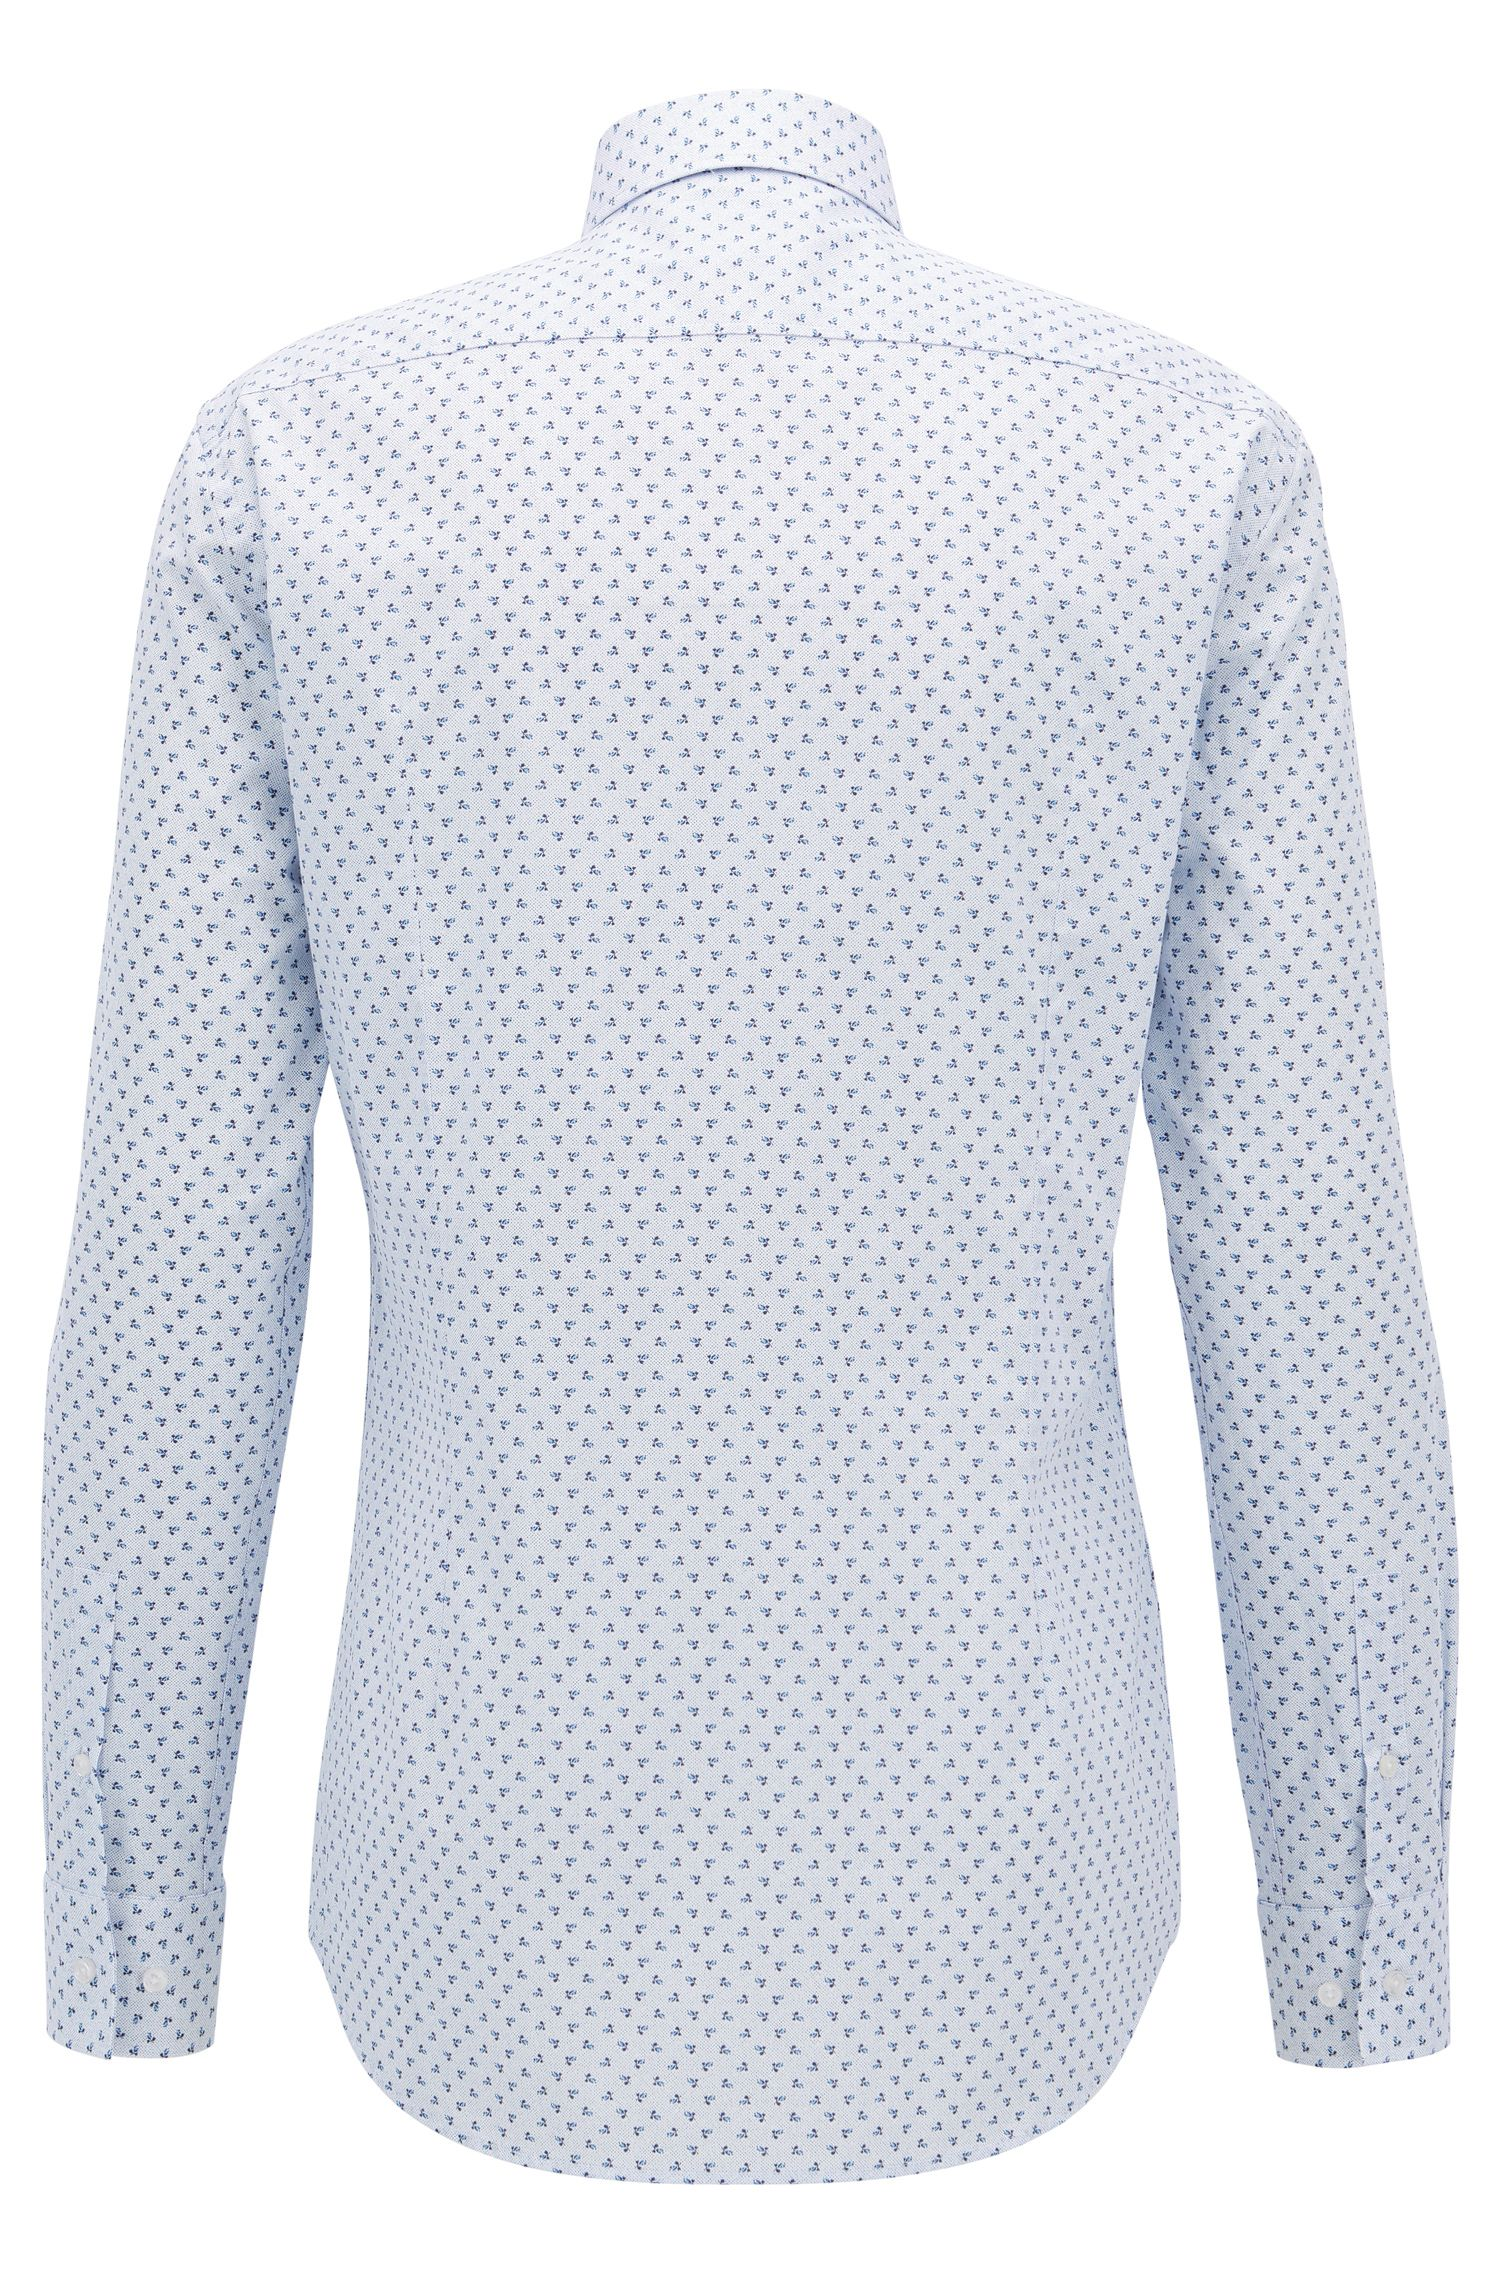 Floral-Print Cotton Dress Shirt, Slim Fit | Ismo, Light Blue